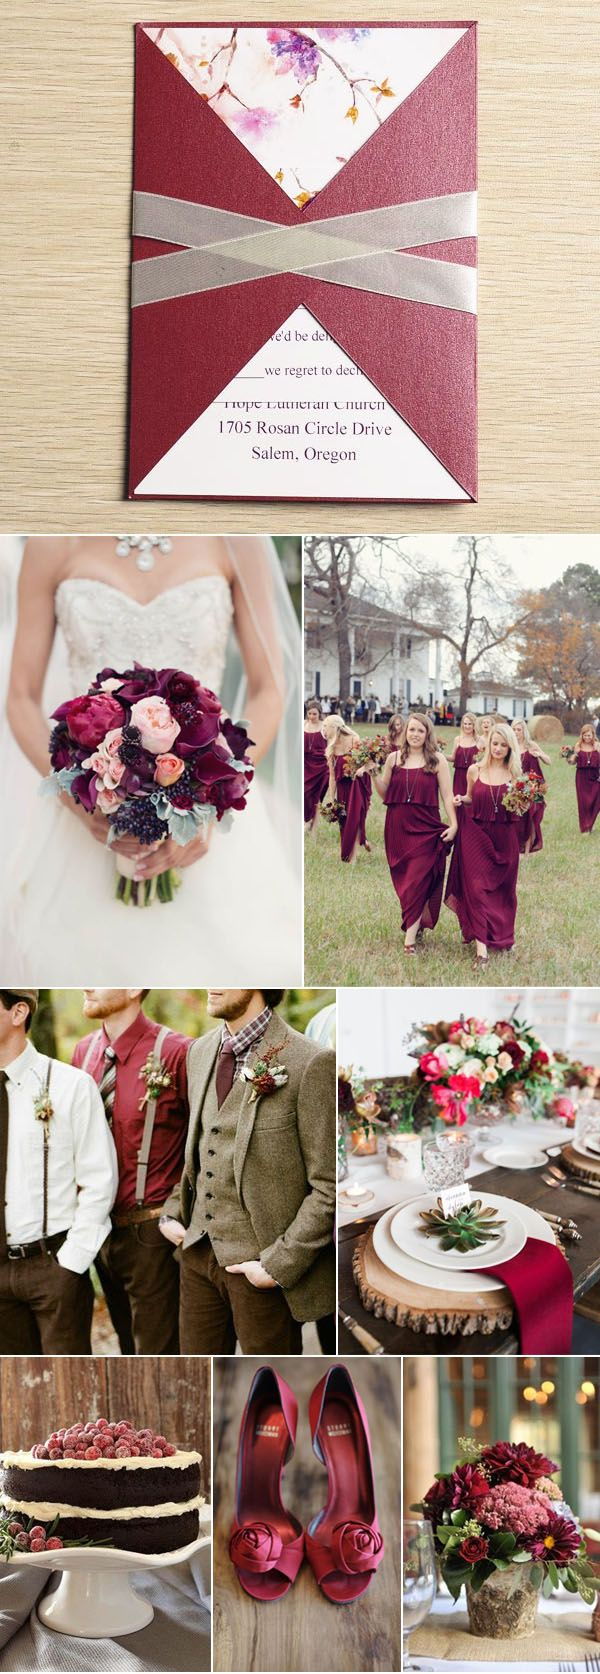 Ten Beautiful Fall Wedding Invitations To Match